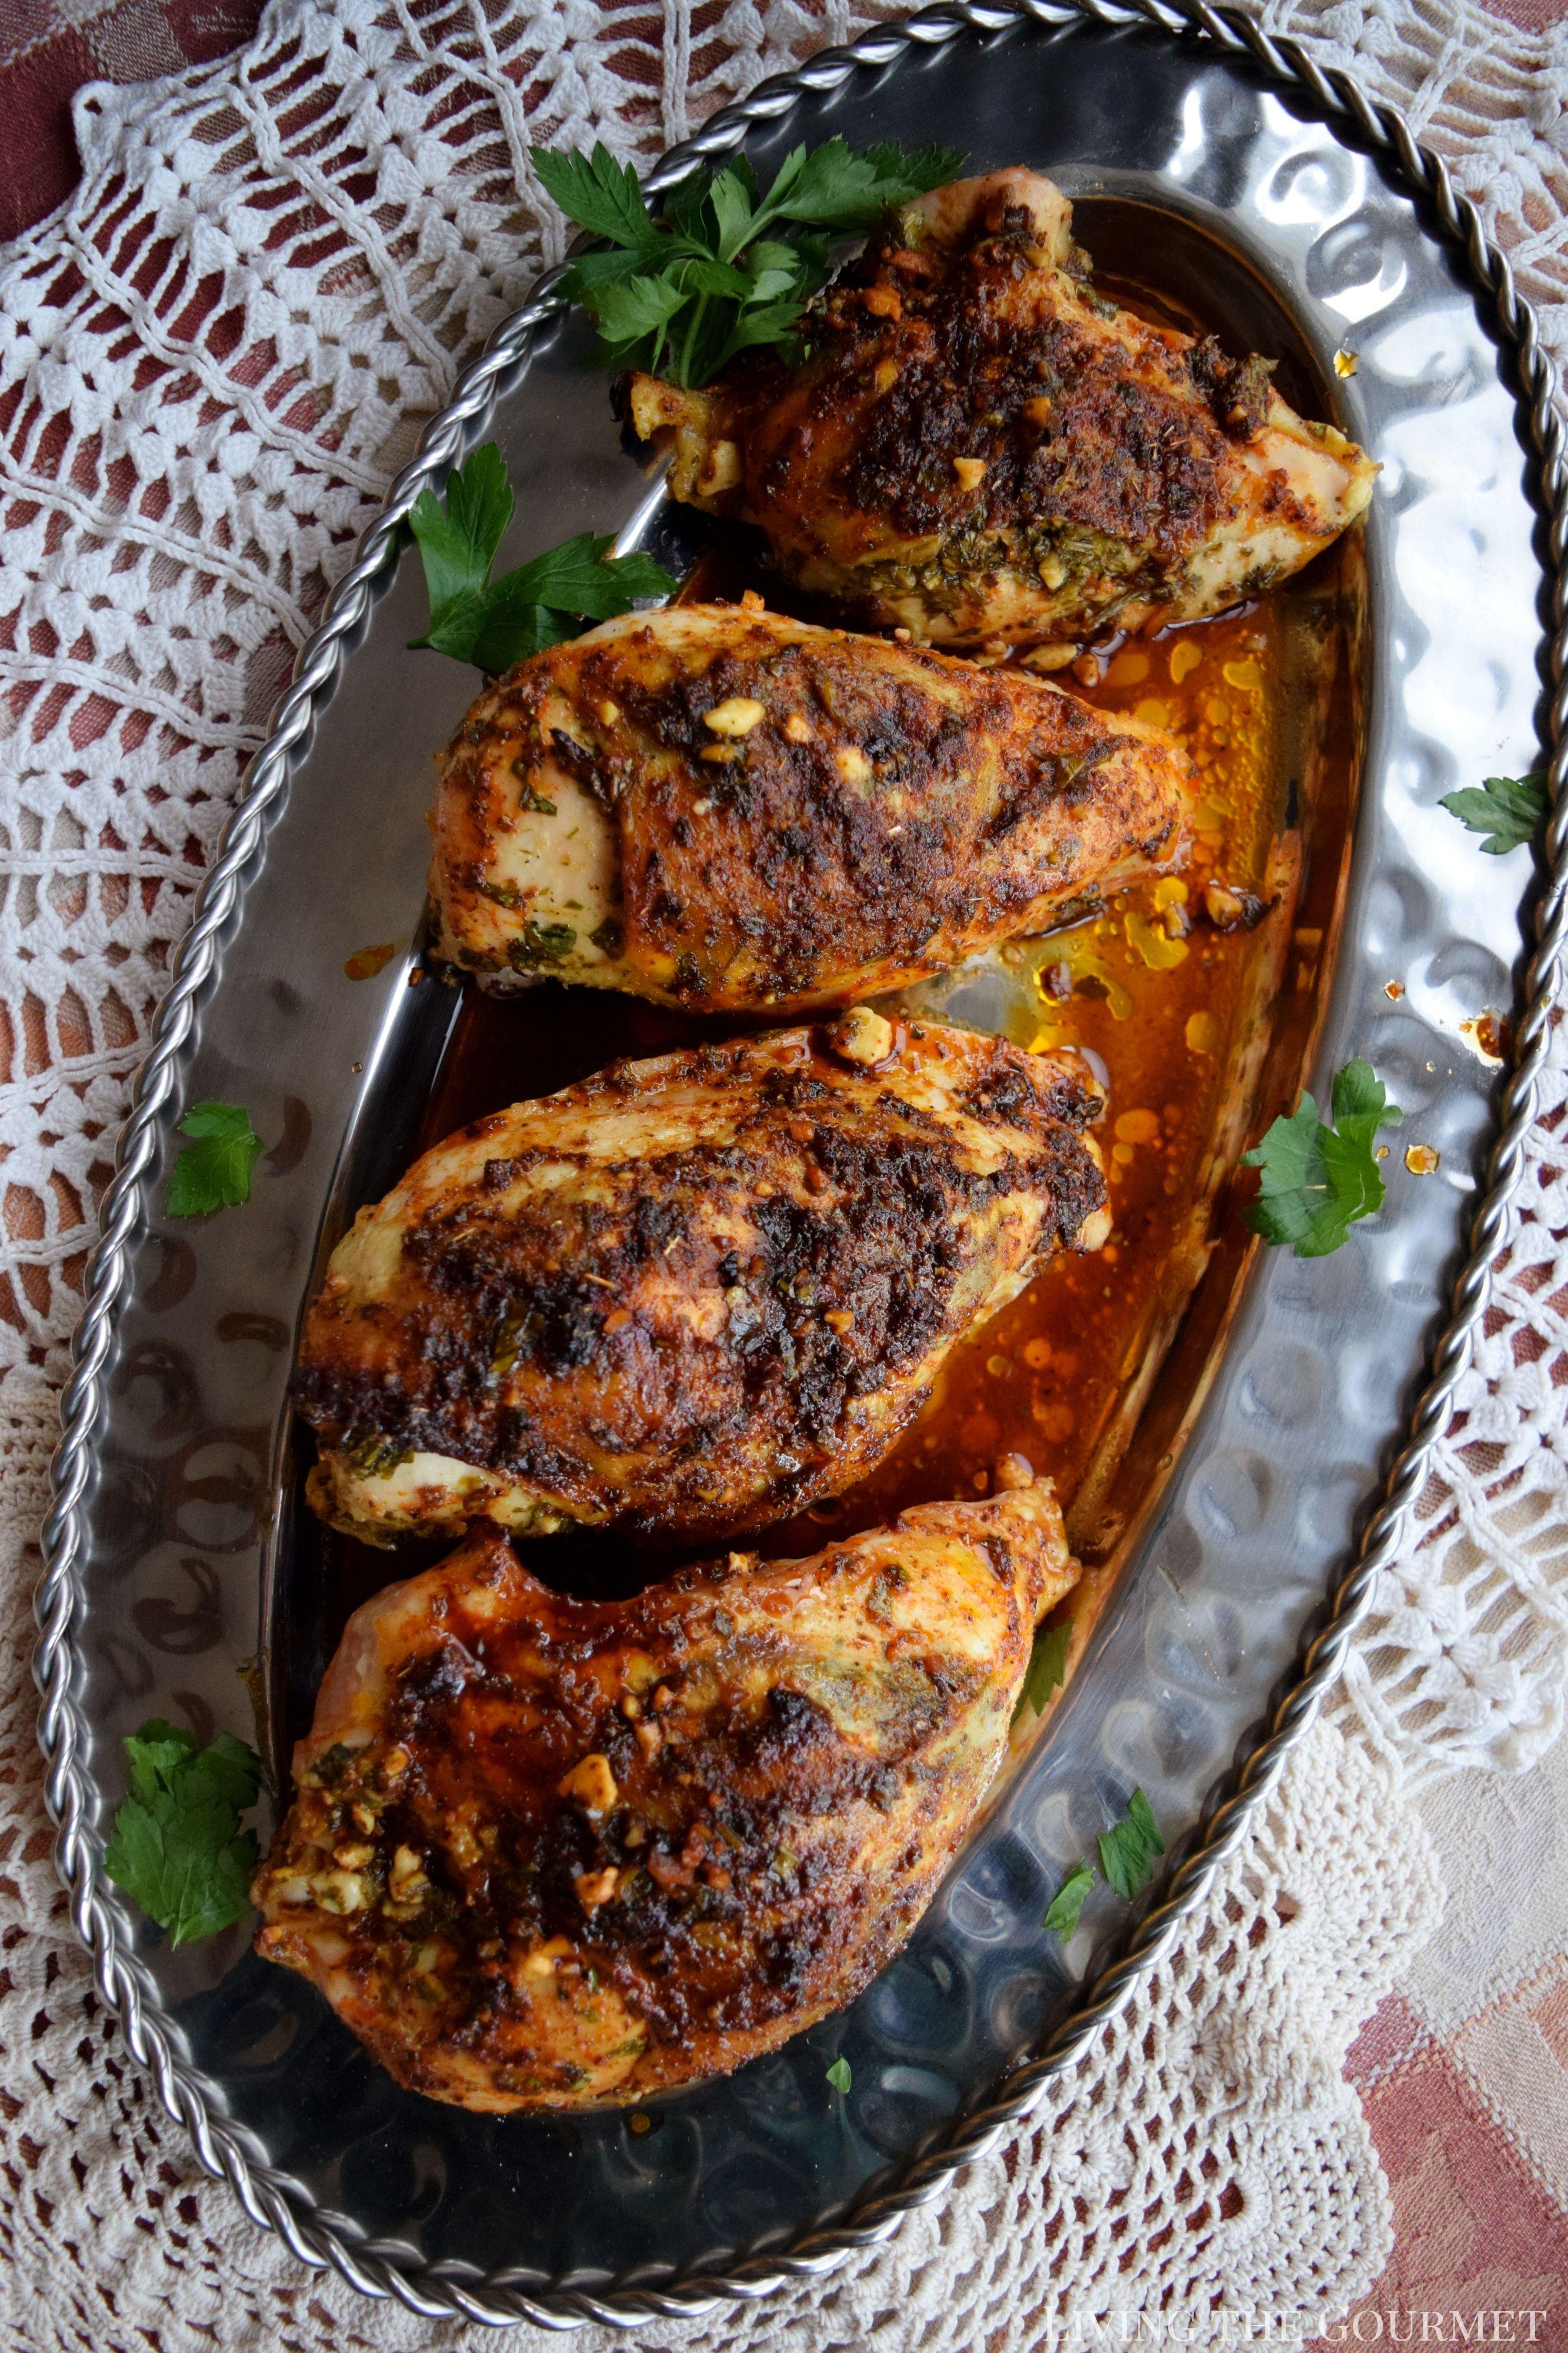 Mediterranean Style Chicken Breast Feautring Vivanco Winery Living